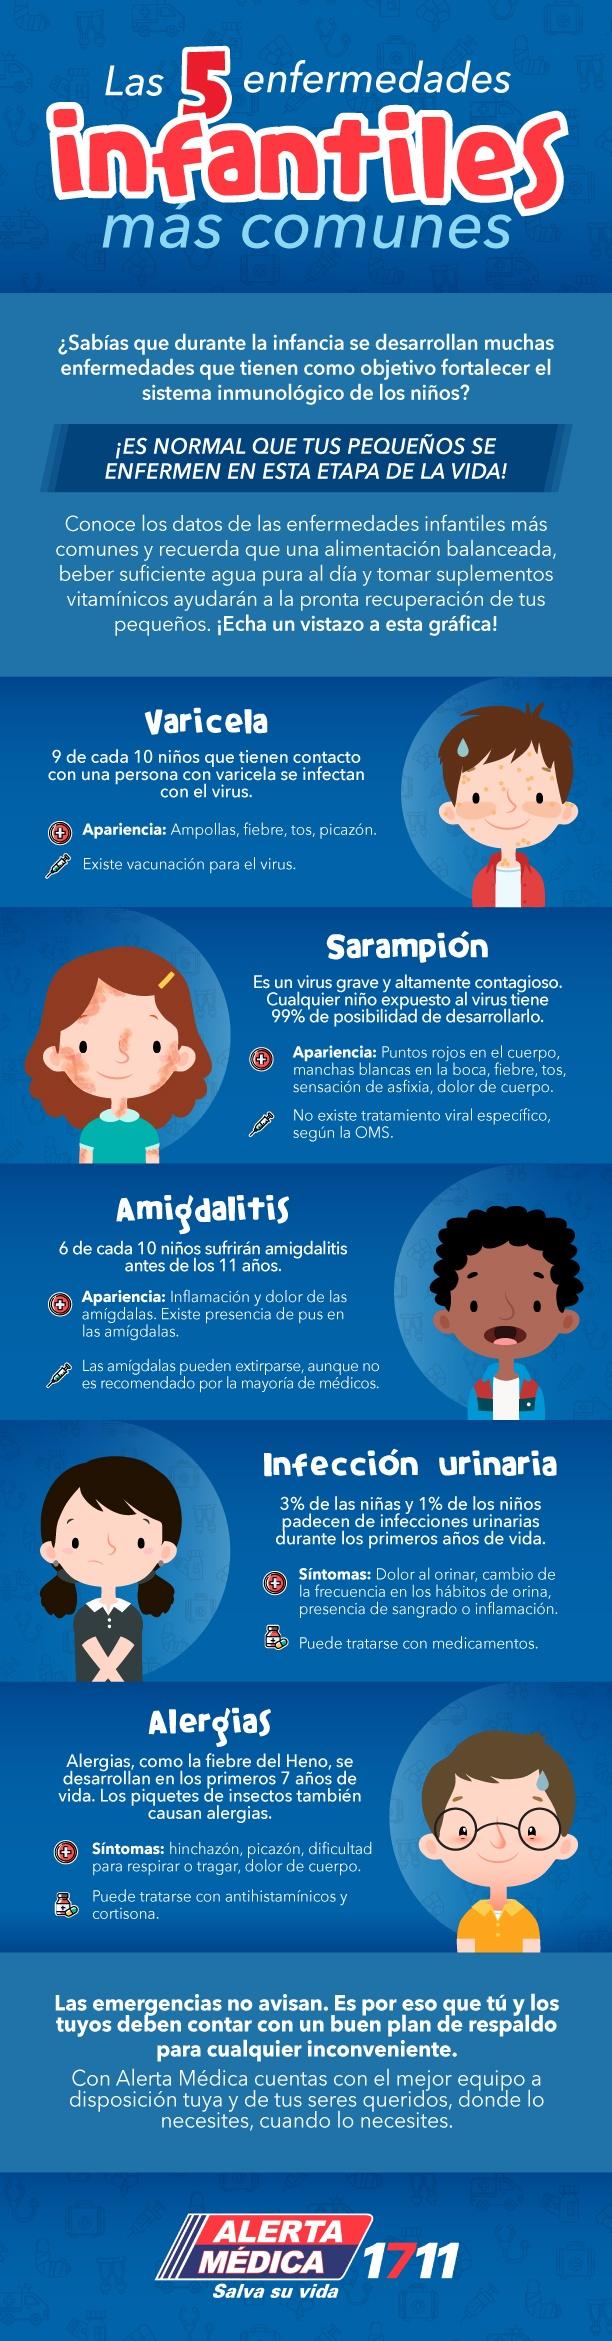 Alerta-Médica-nfermedades-infantiles-más-comunes